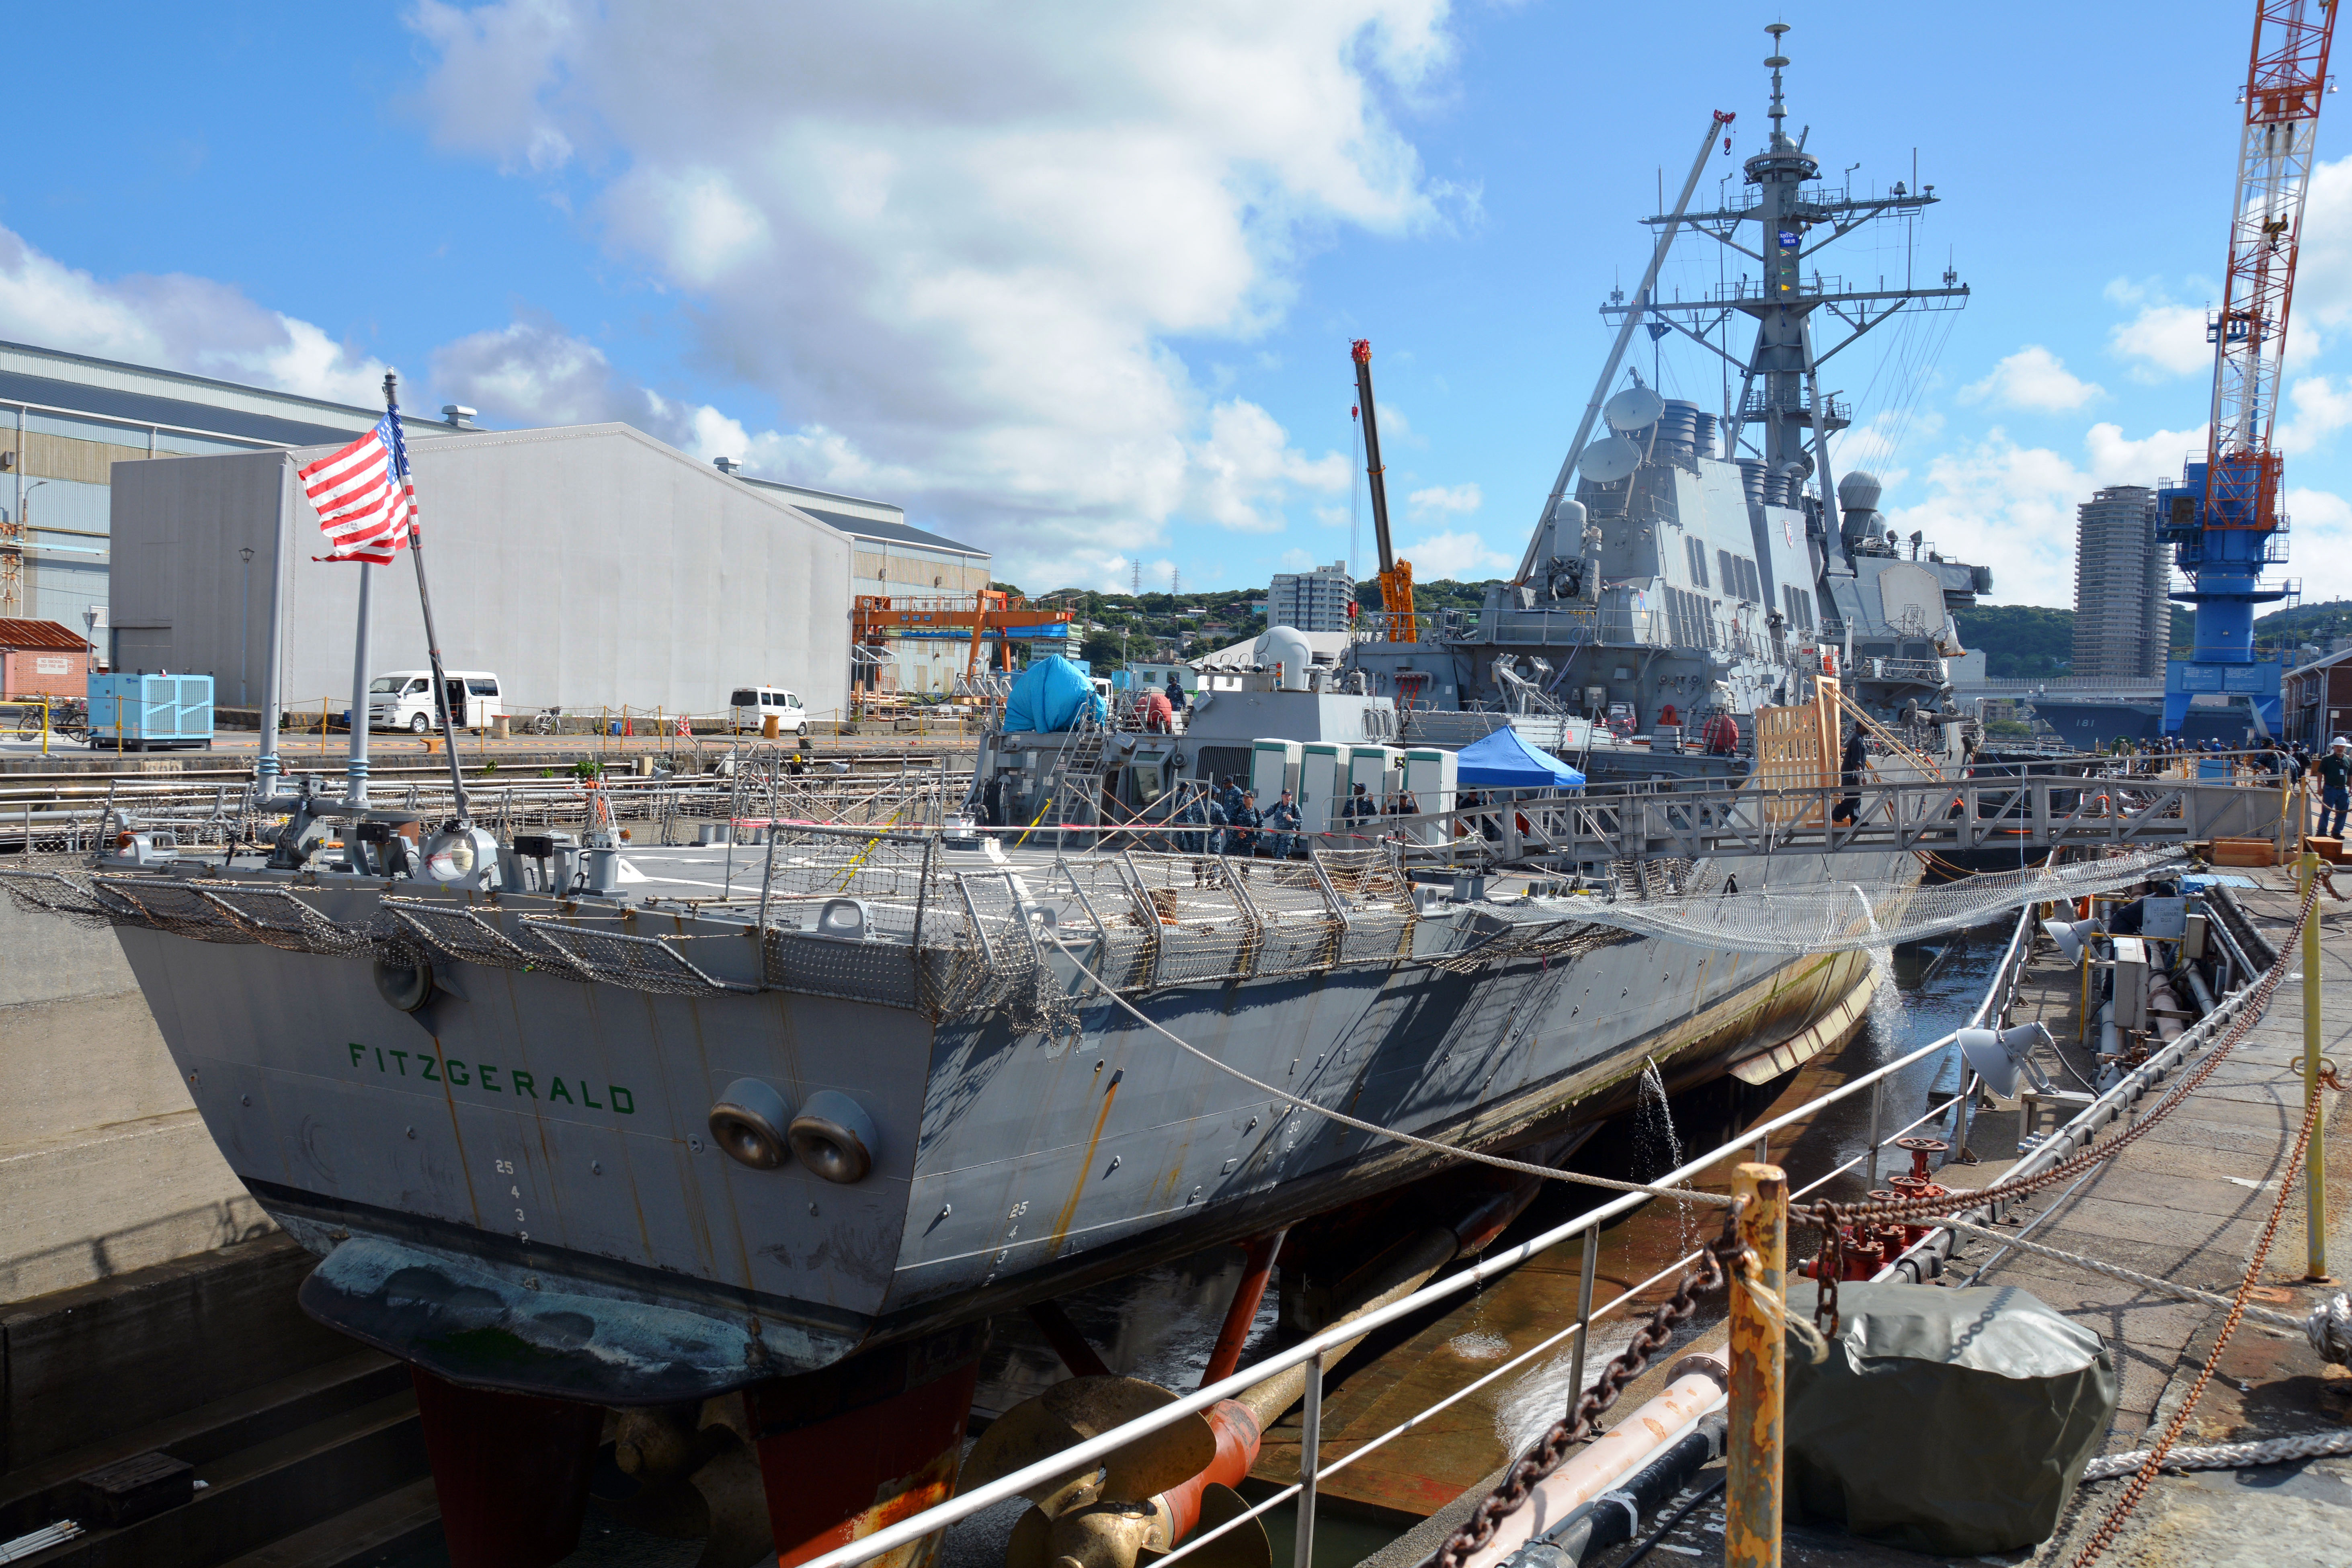 Collision destroyer USS Fitzgerald avec un navire marchand ! - Page 6 35910397856_d9c27b40b5_o